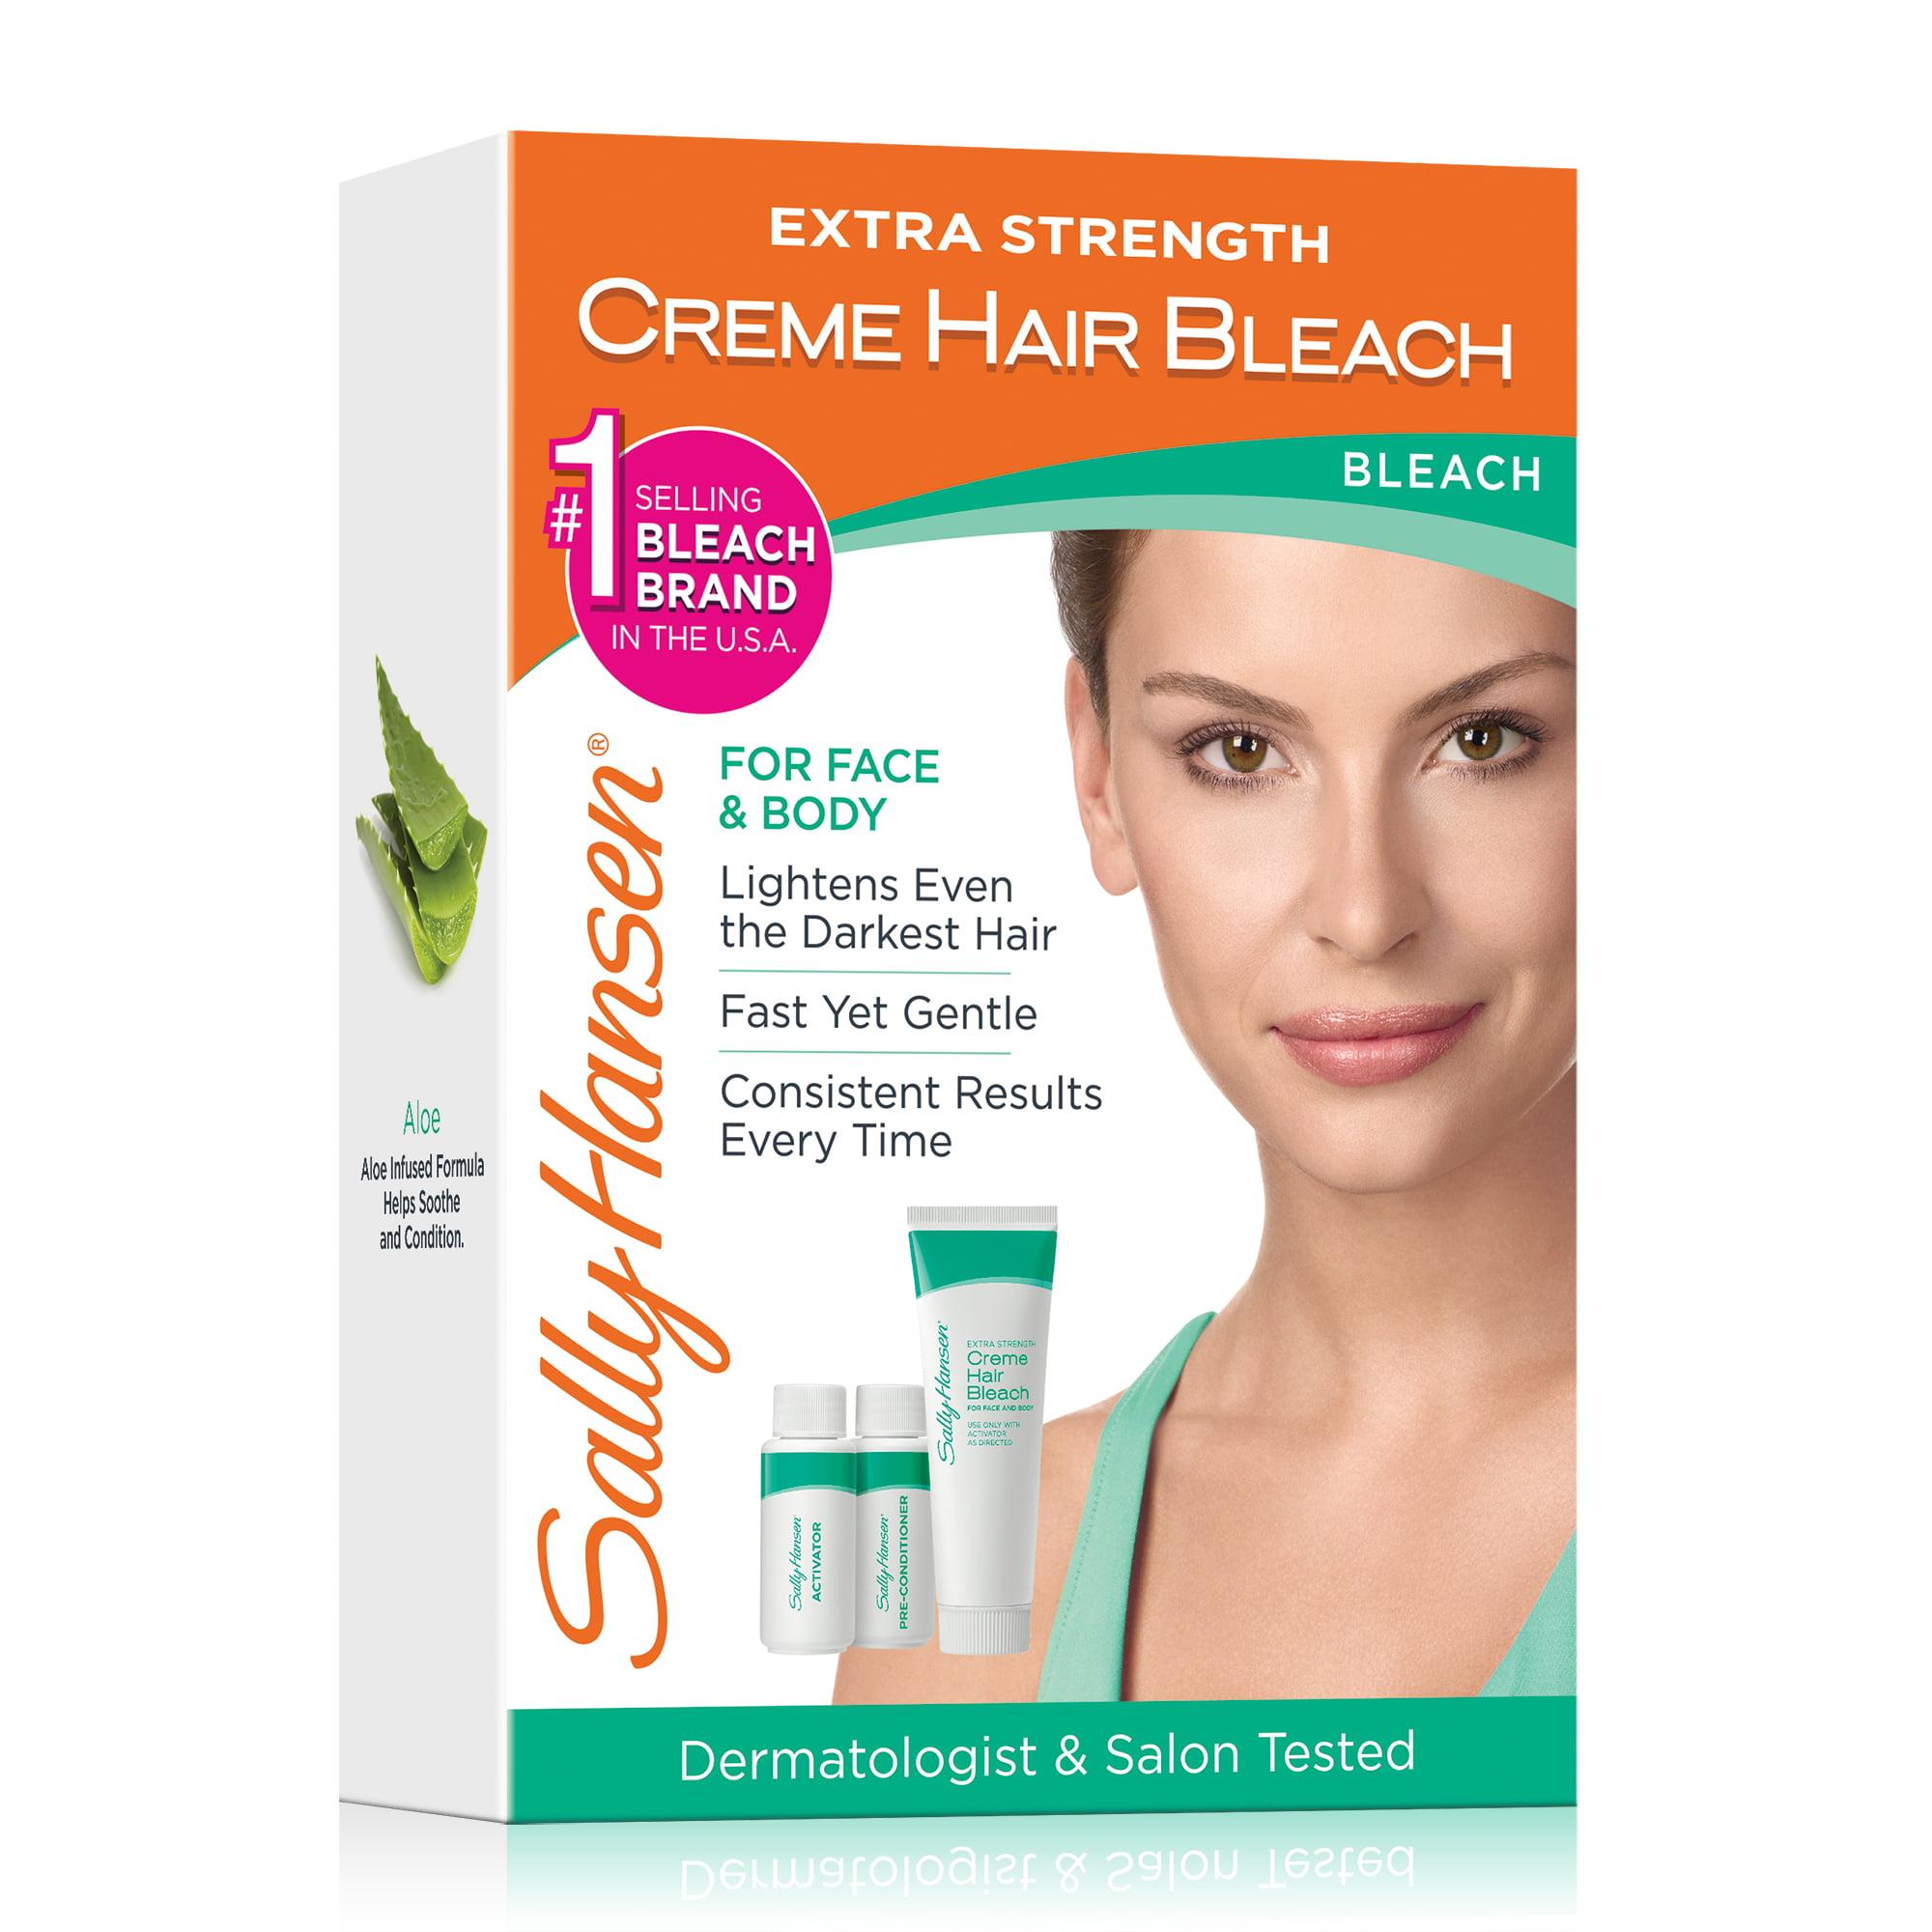 Sally Hansen Extra Strength Creme Hair Bleach For Face & Body Kit